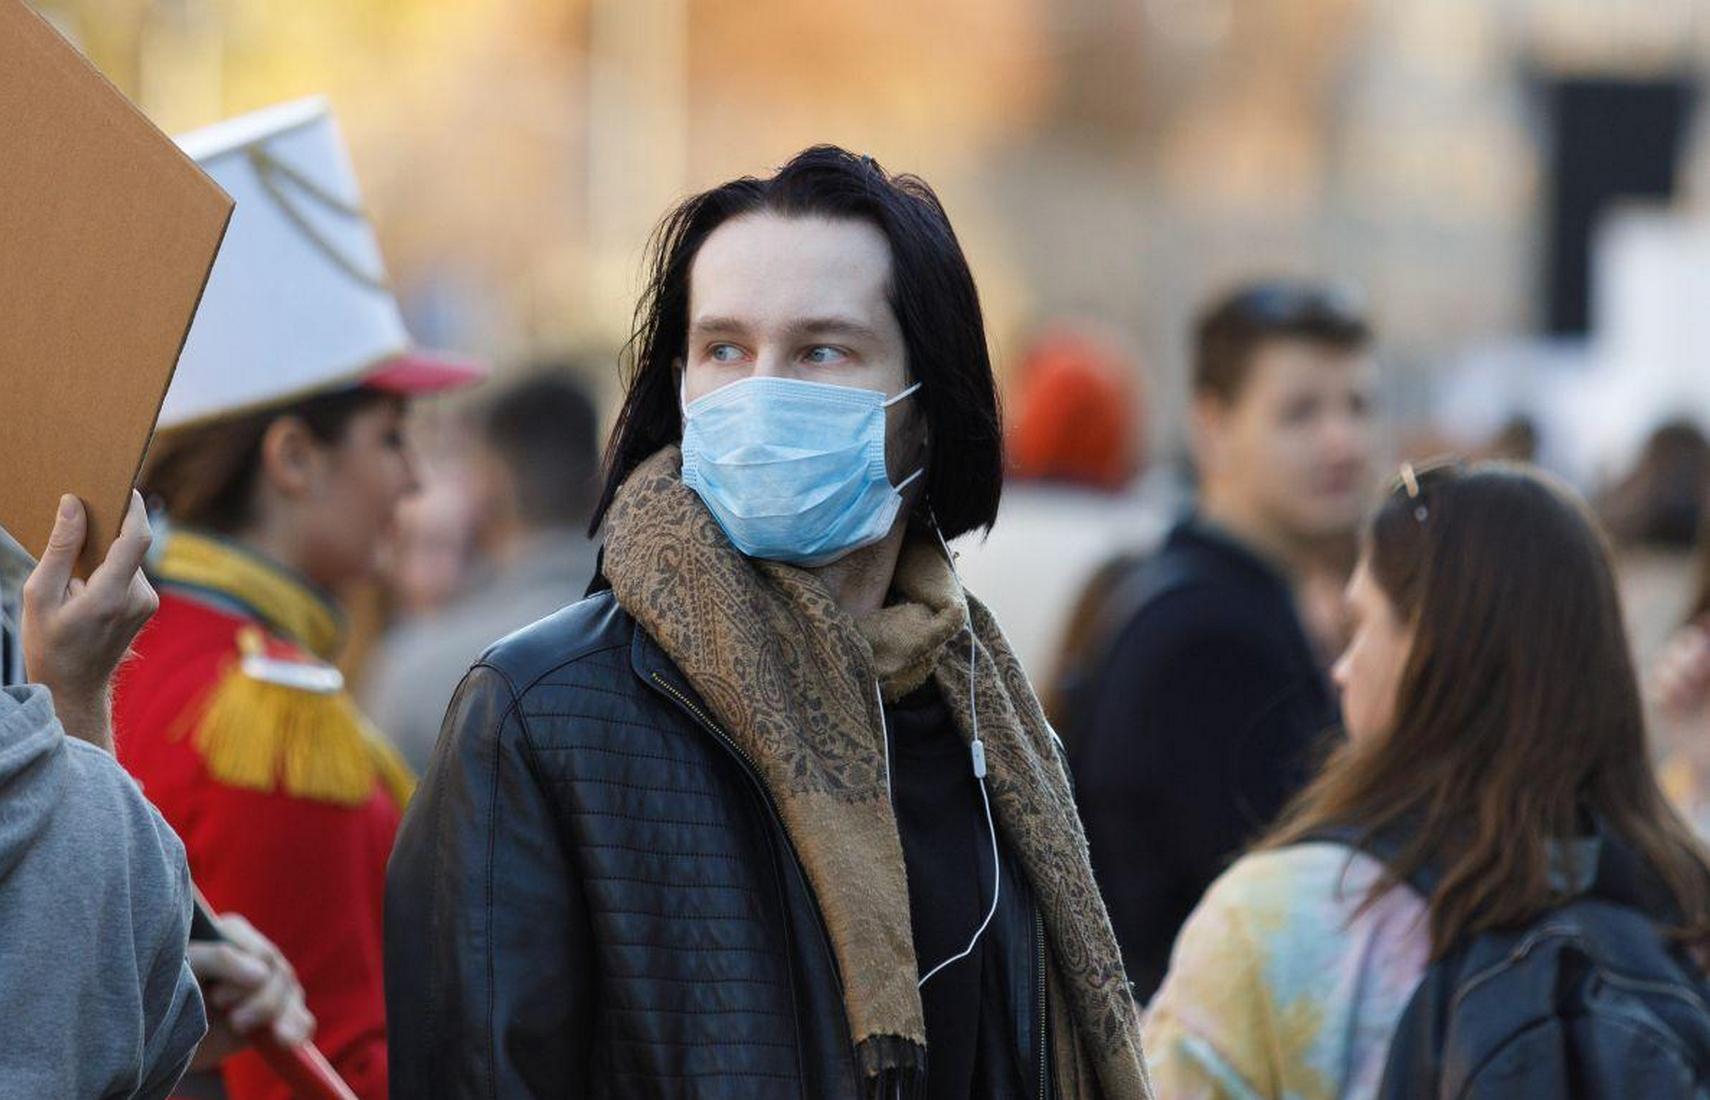 В Украине зафиксировано почти 13 тысяч случаев COVID-19 за сутки